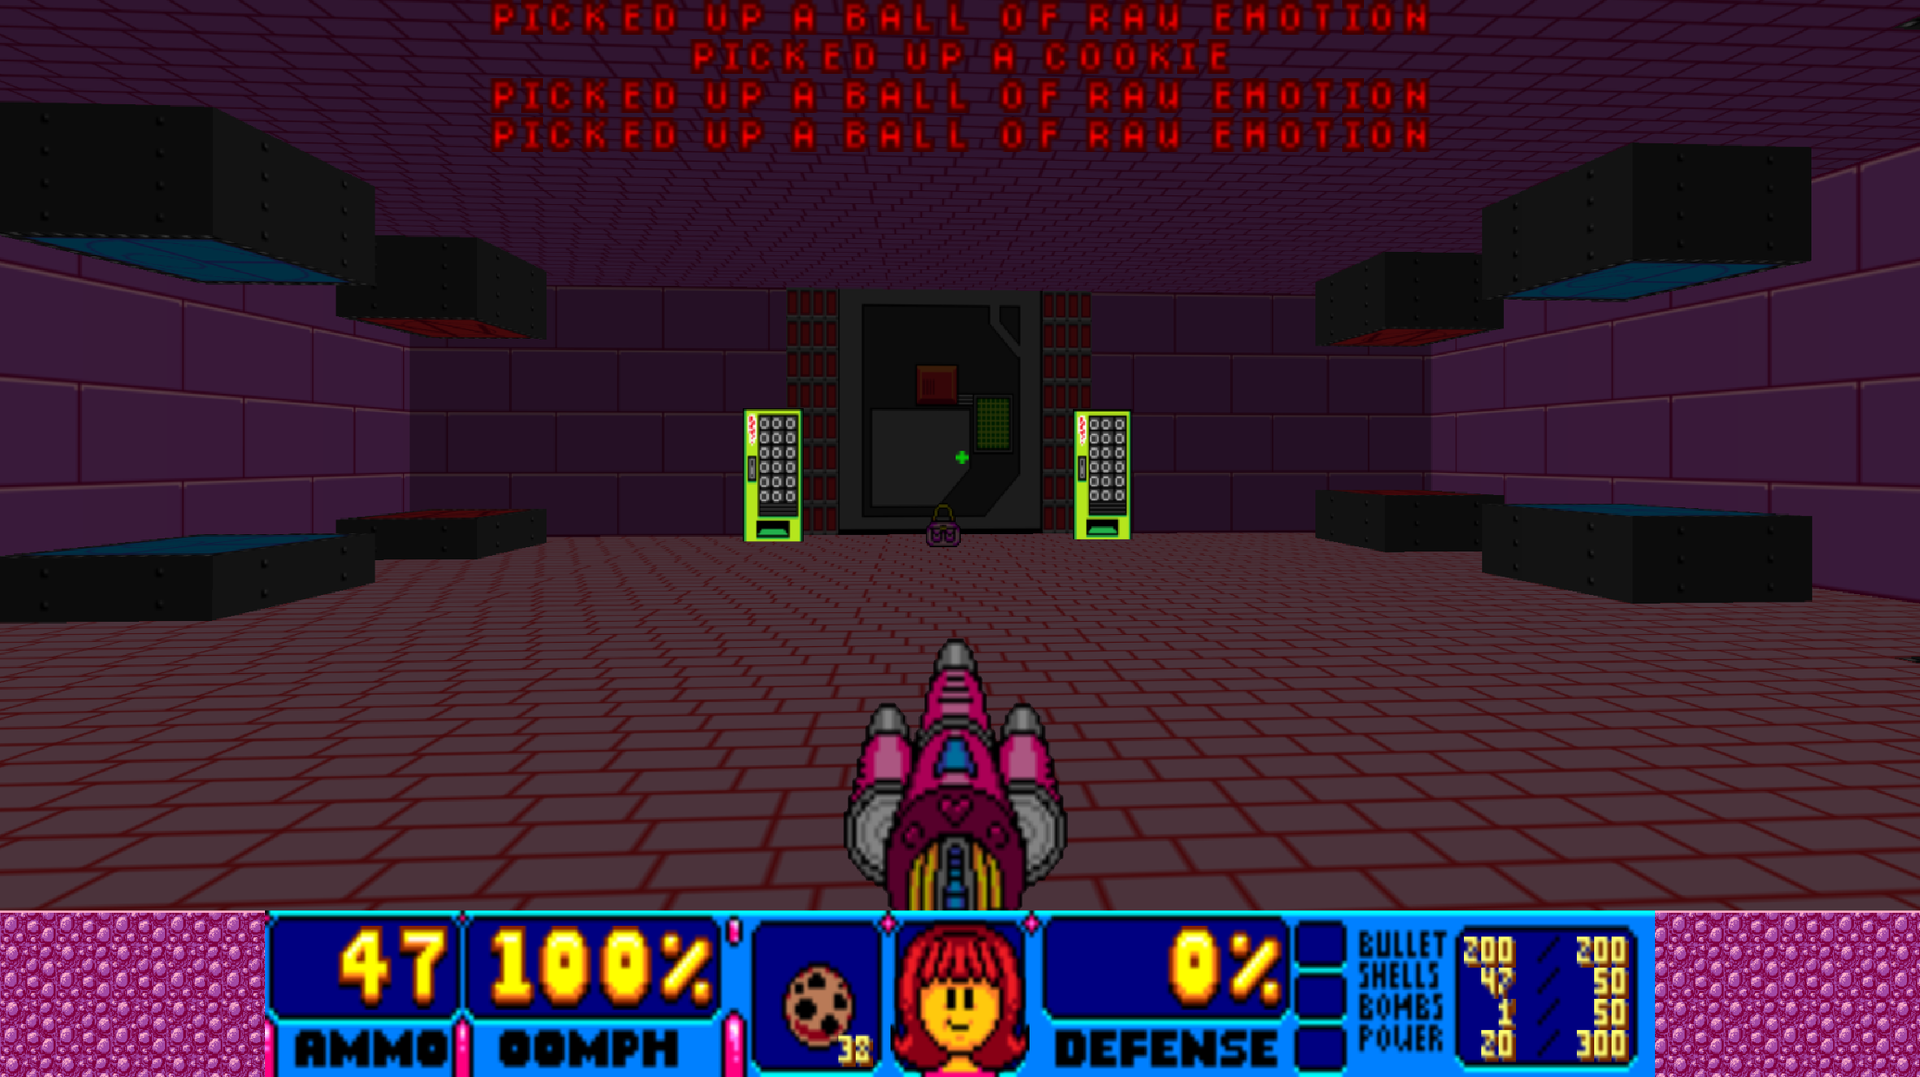 Screenshot_Doom_20190613_082621.png.f546e2a8354c30bb954f35c116019cdd.png